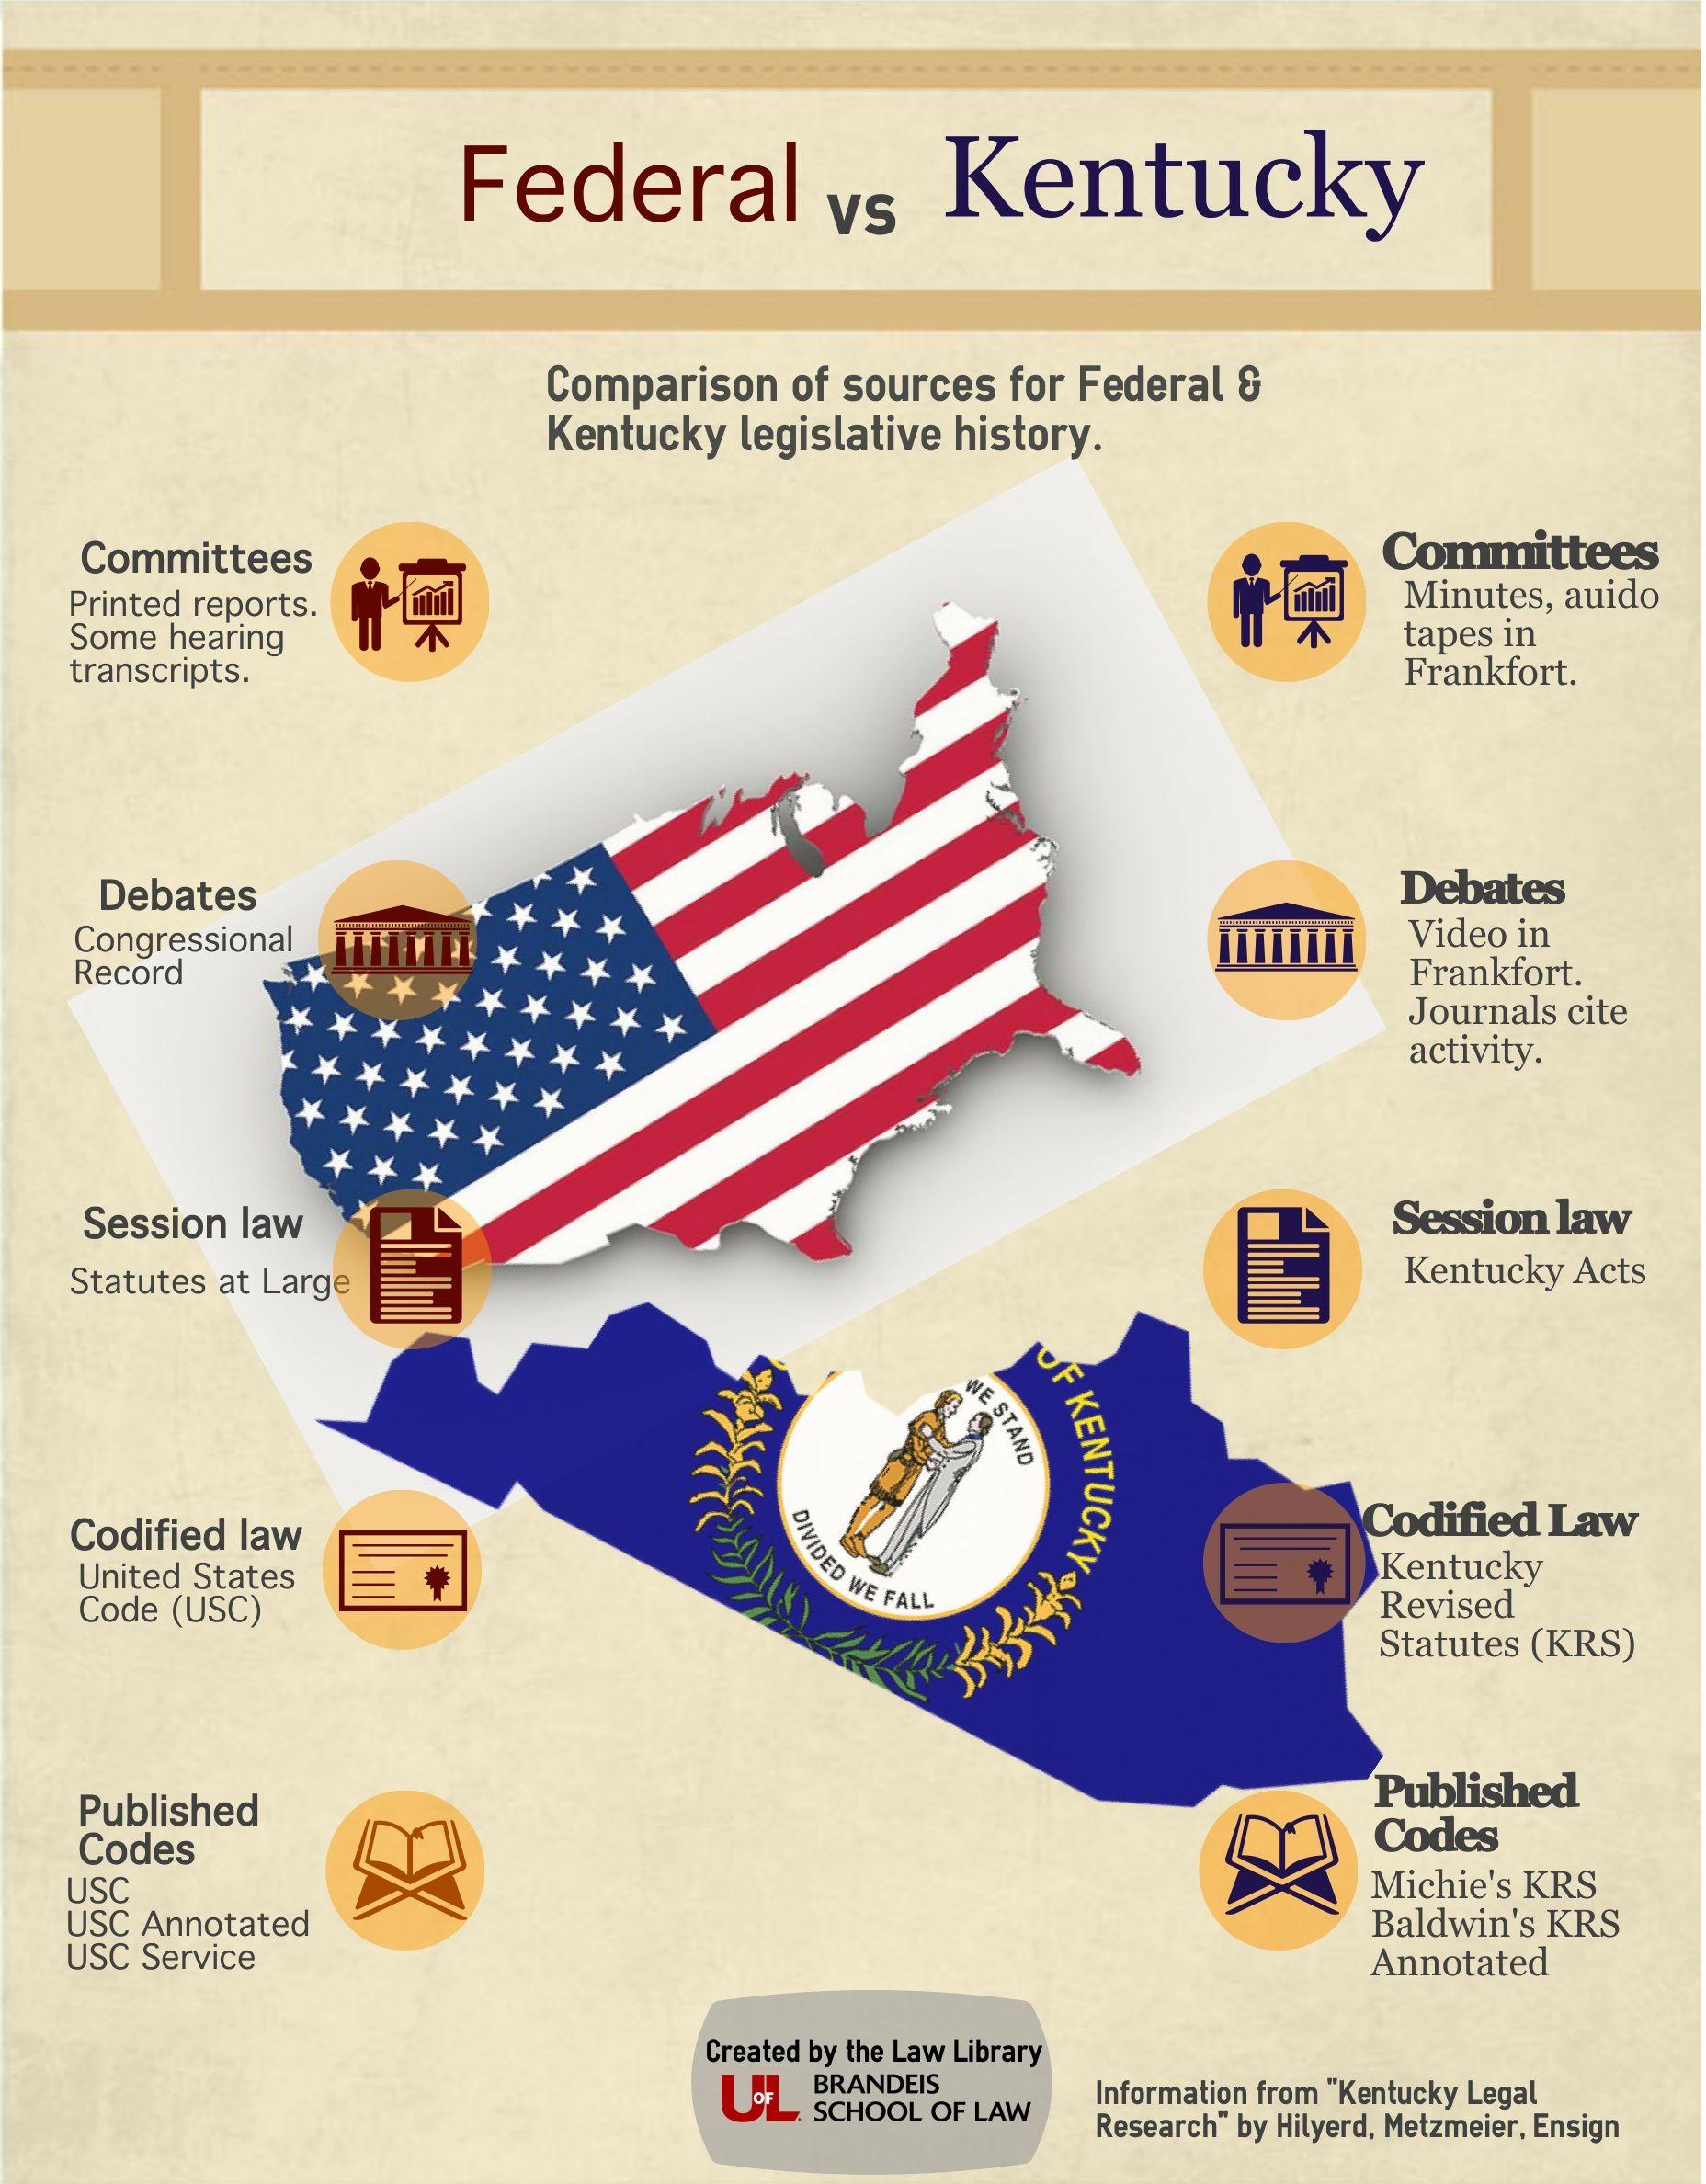 Legislative History Sources